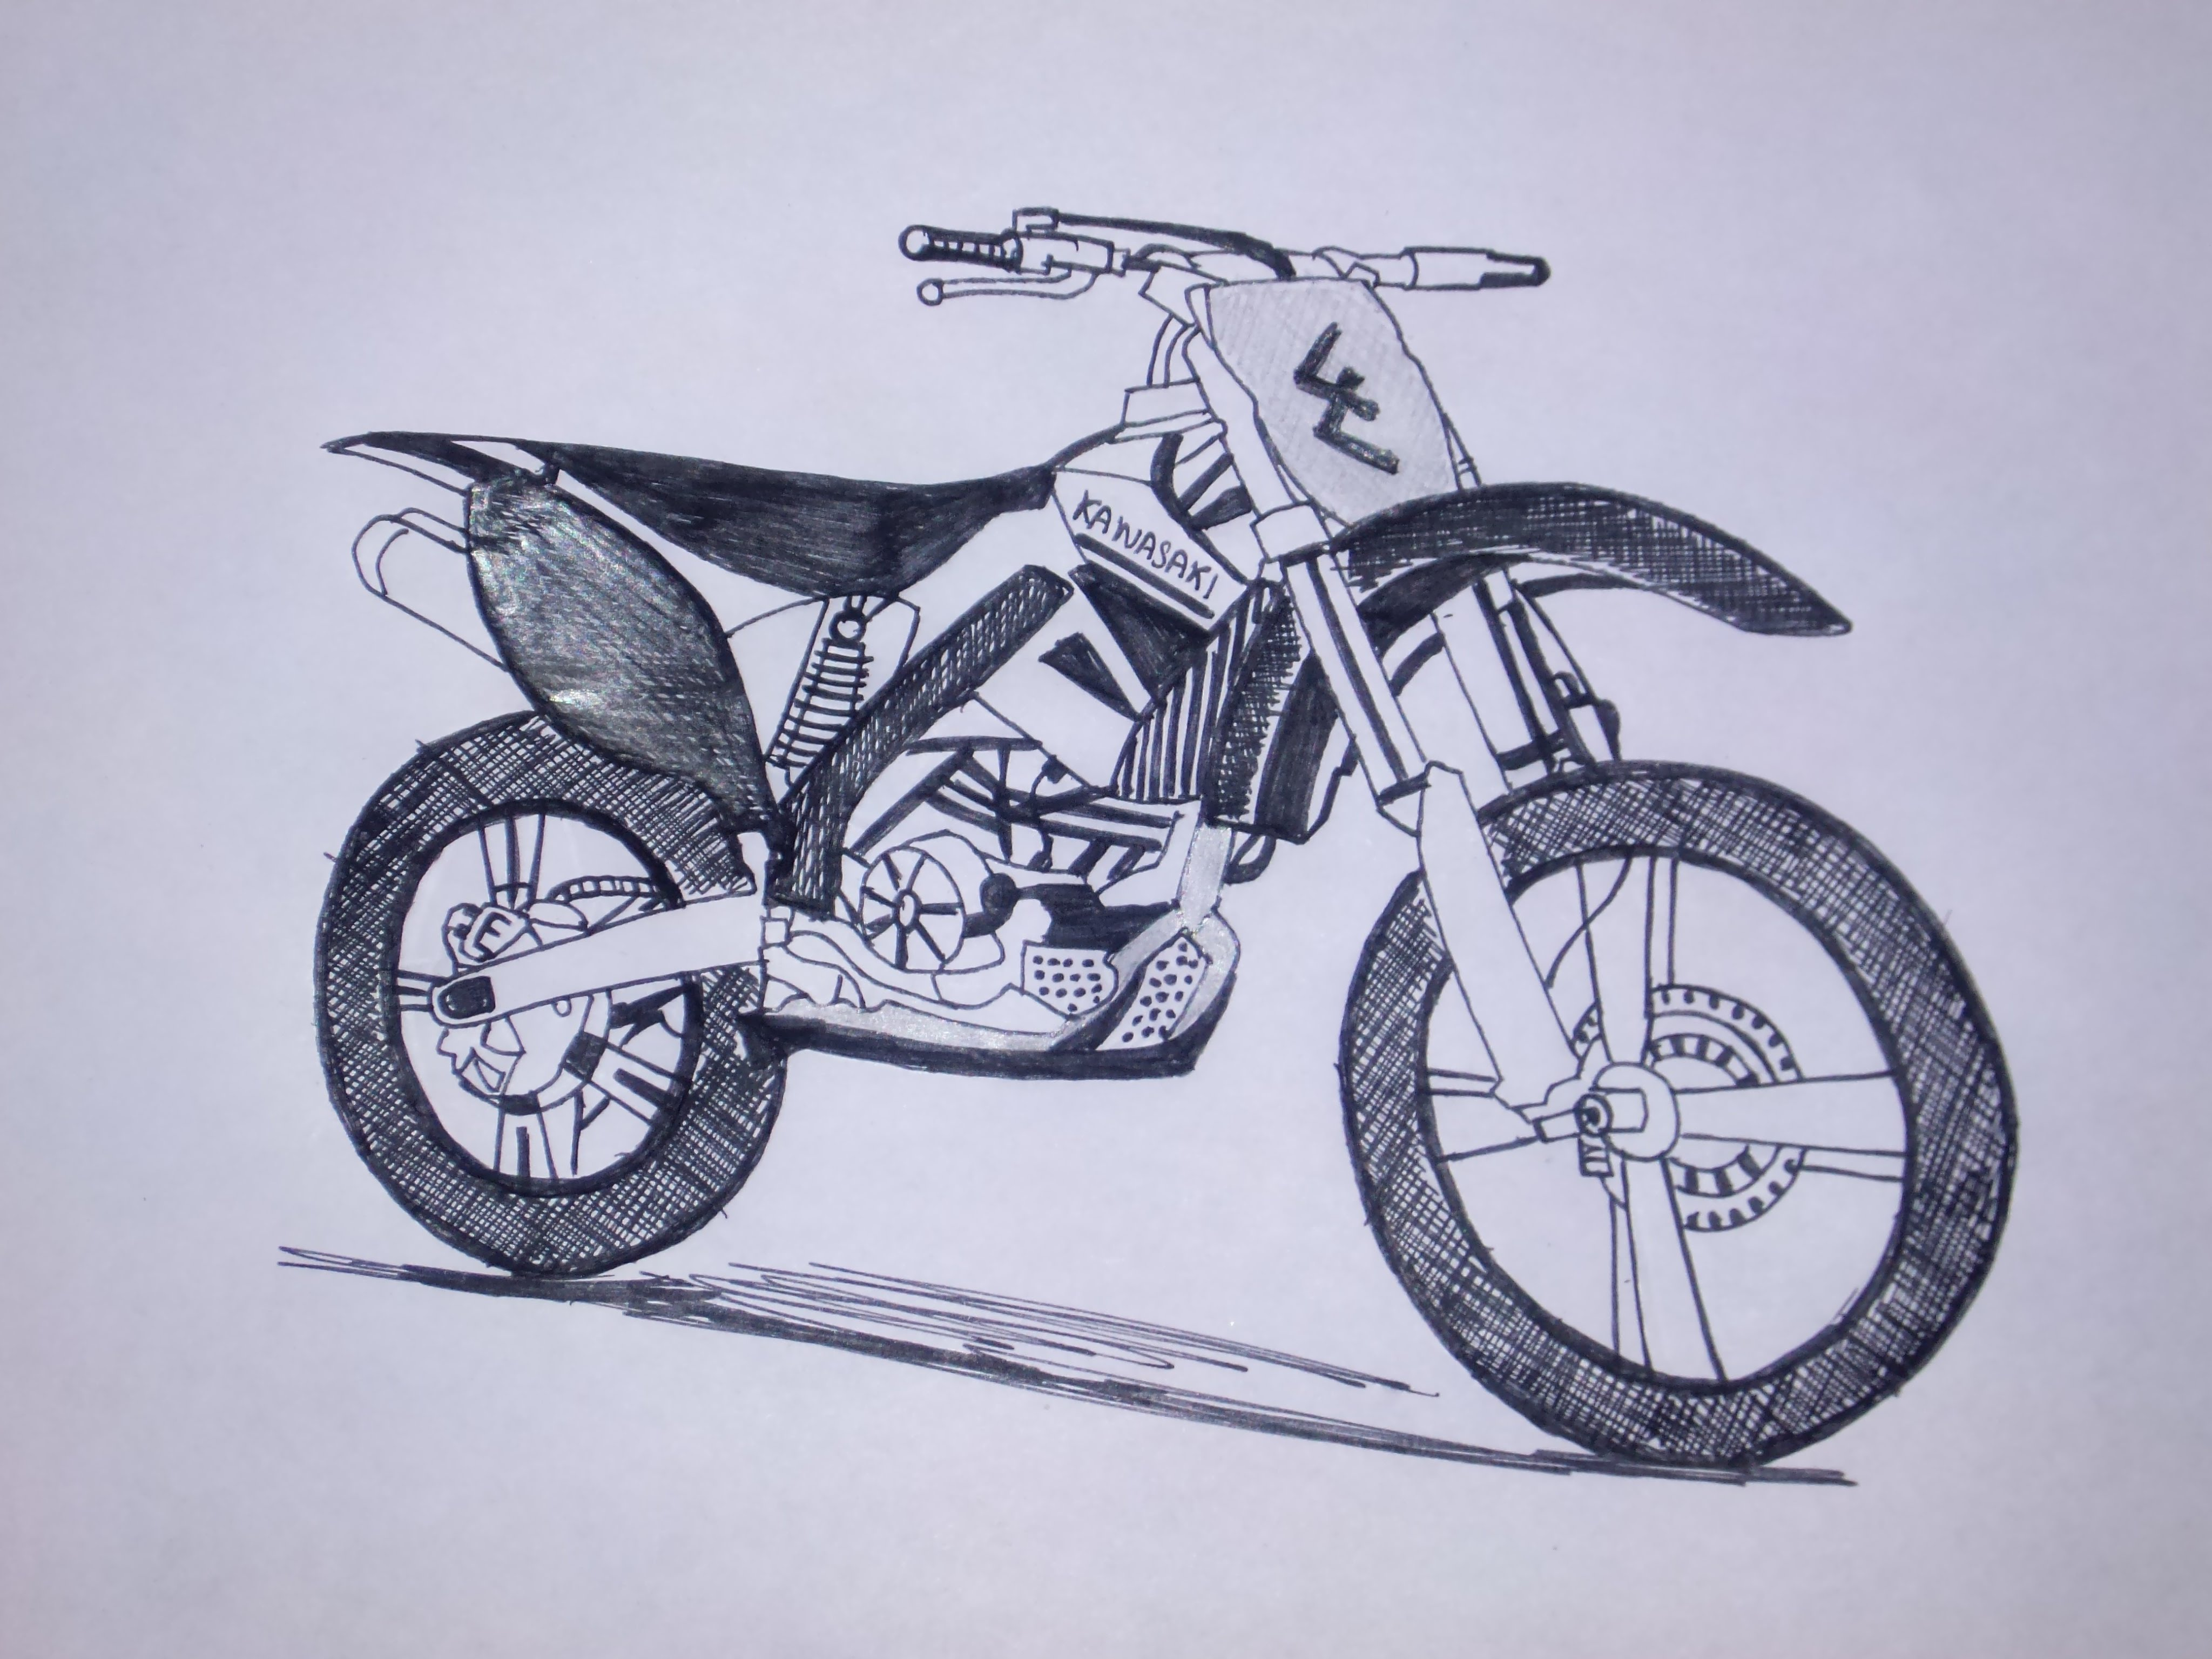 4096x3072 Kawasaki Dirt Bike Drawing Pen Sketch